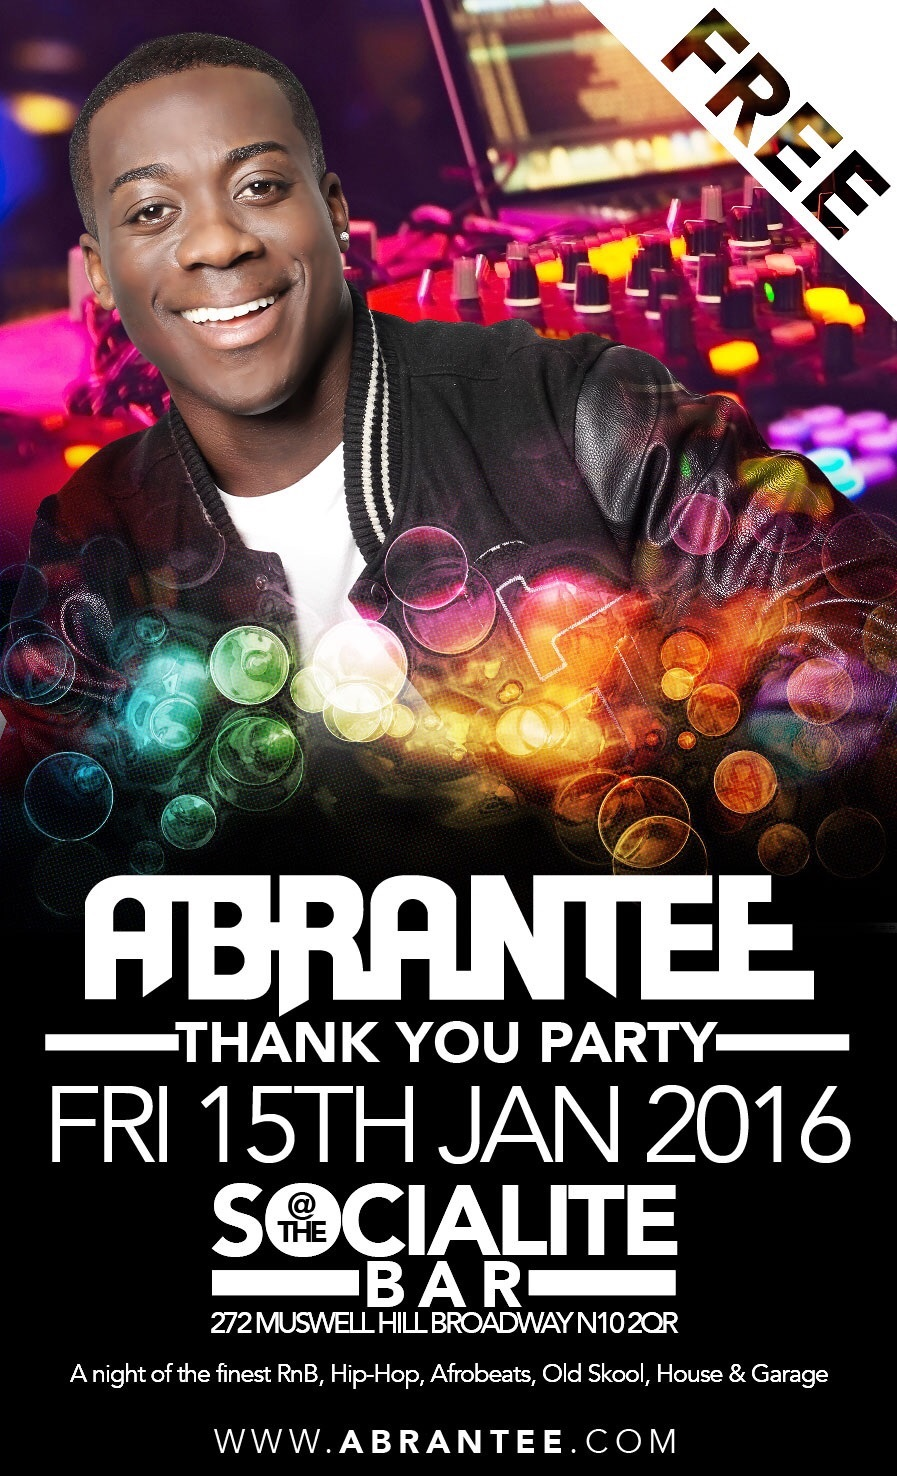 ABRANTEE  FREE THANK YOU PARTY